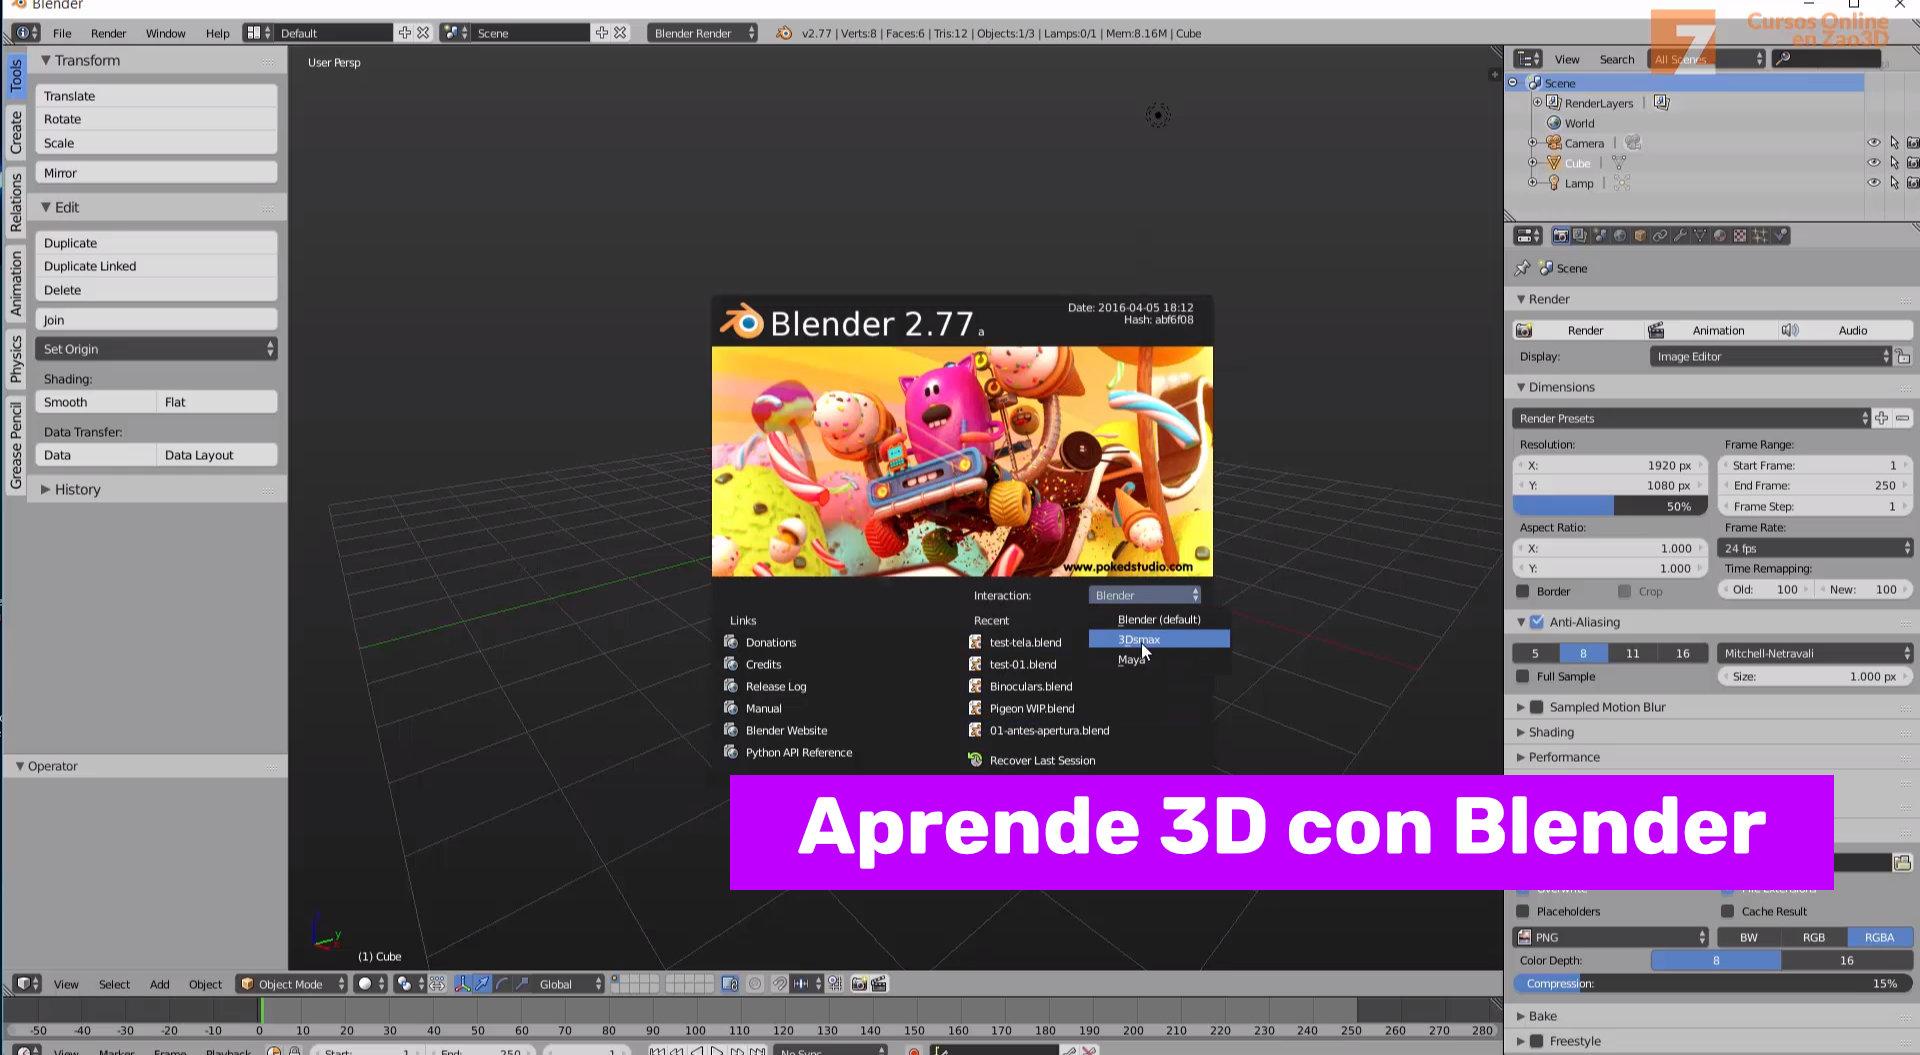 El interface de Blender